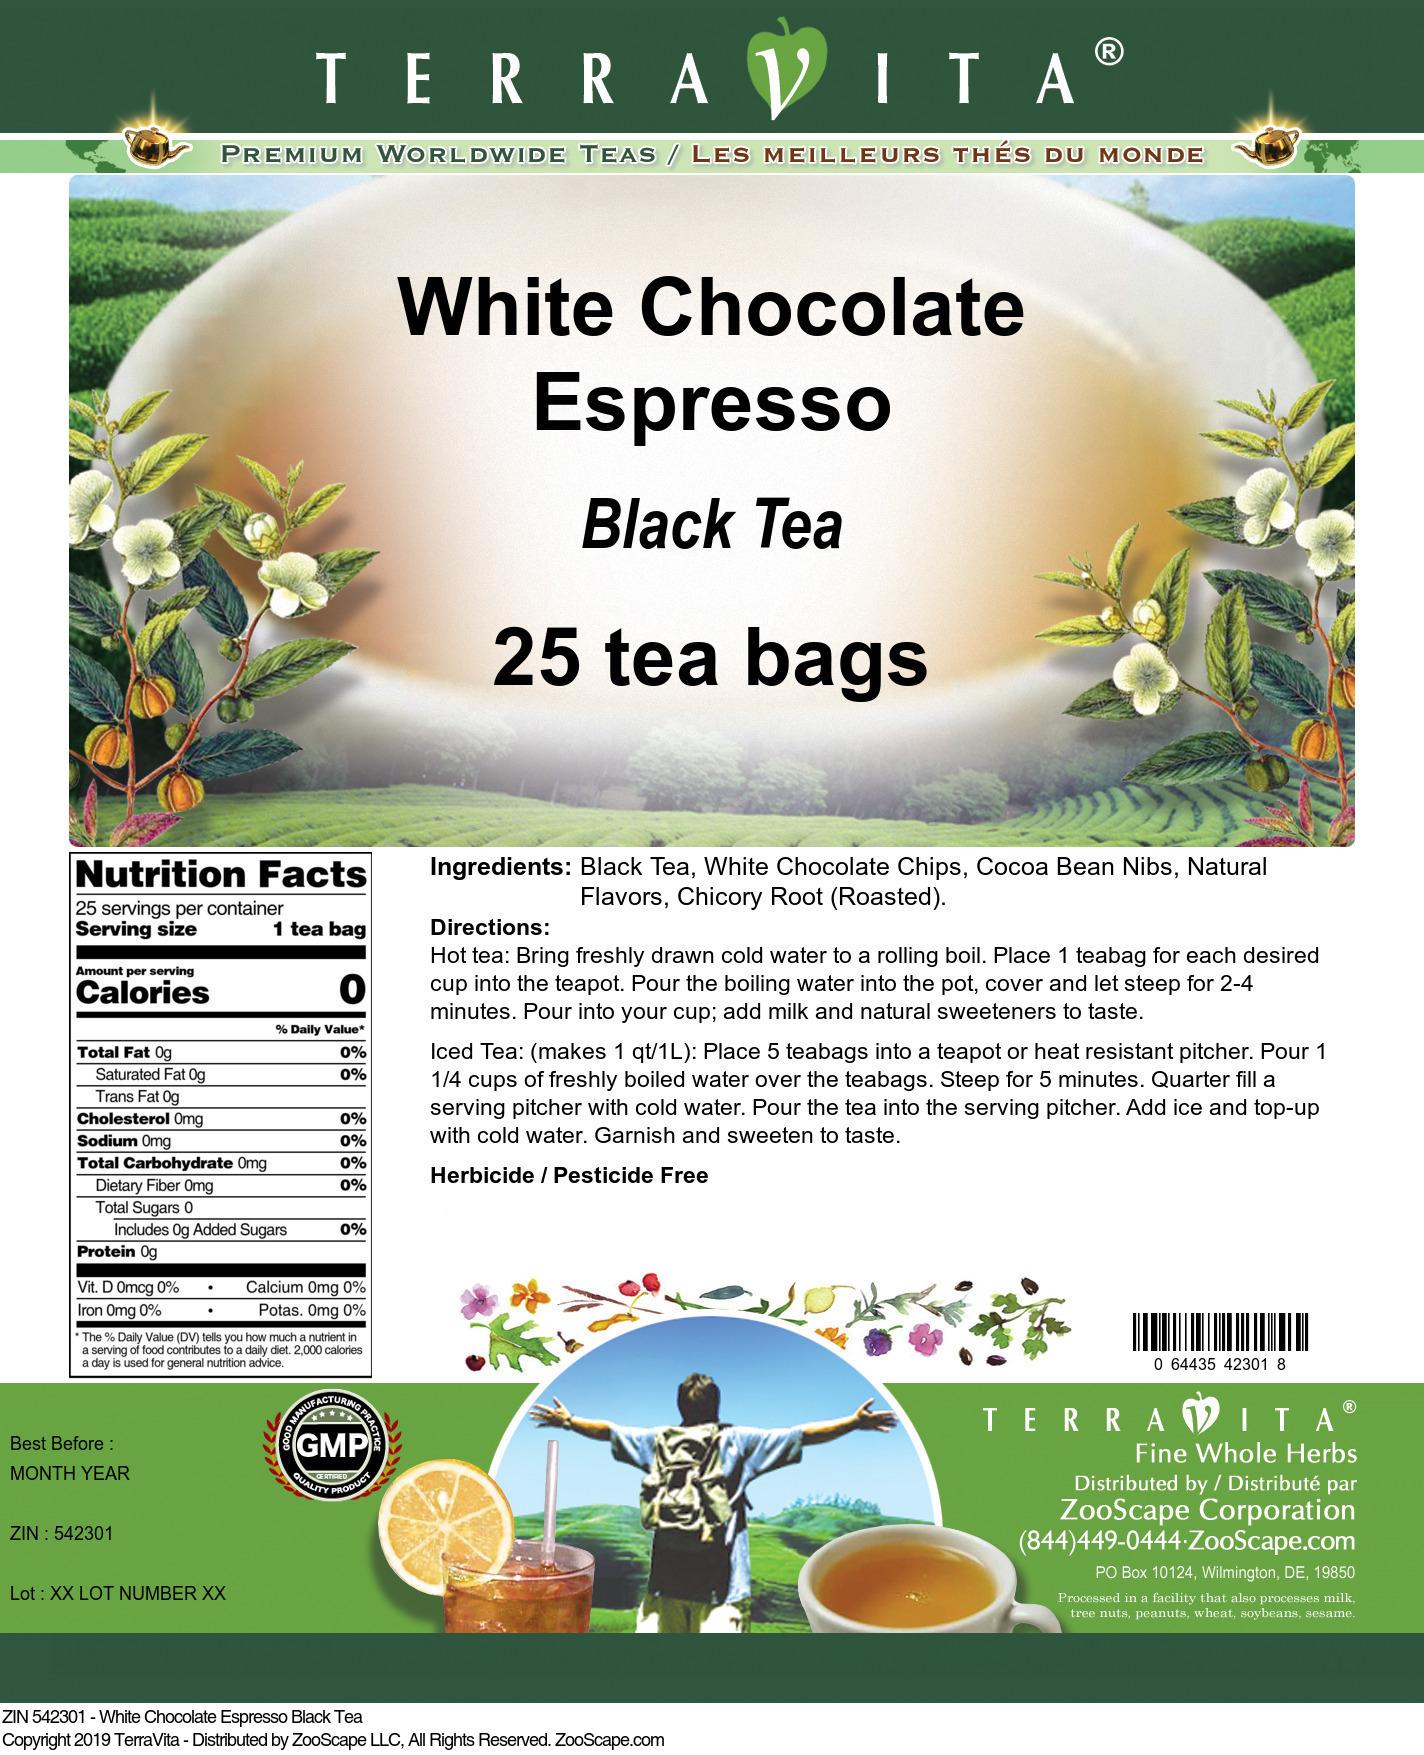 White Chocolate Espresso Black Tea